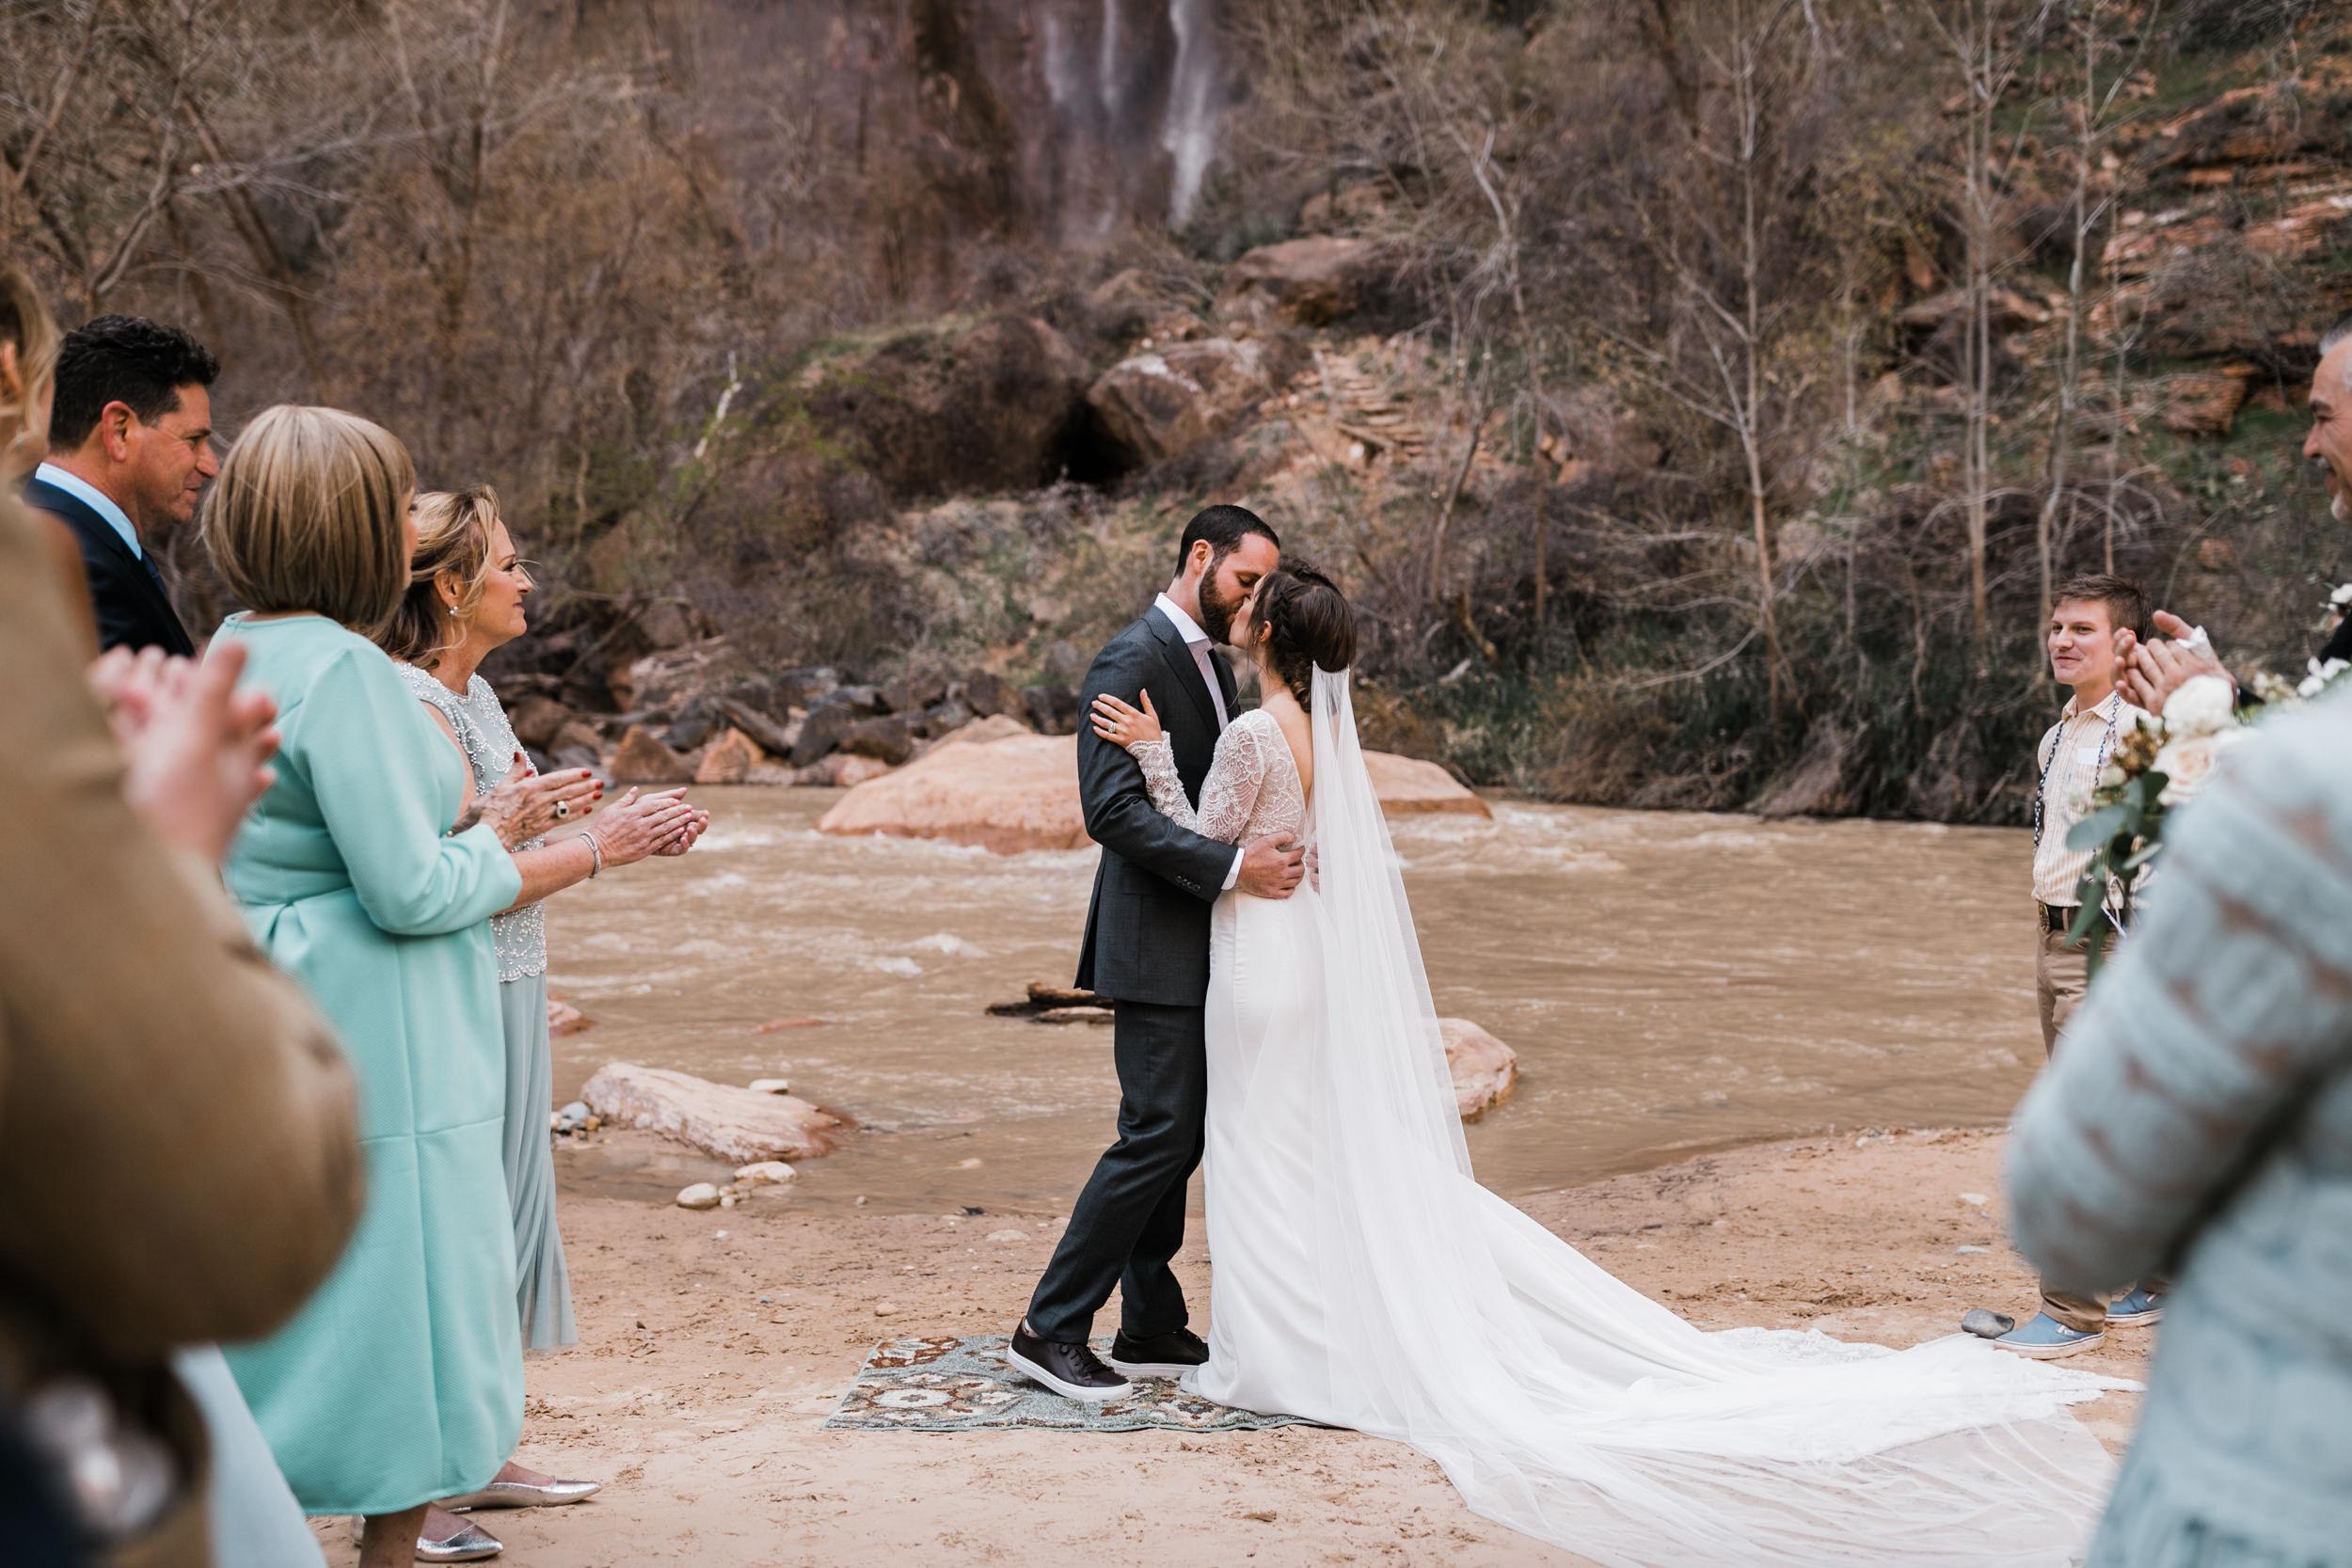 Zion-National-Park-Adventure-Wedding-Hearnes-Elopement-Photography-12.jpg